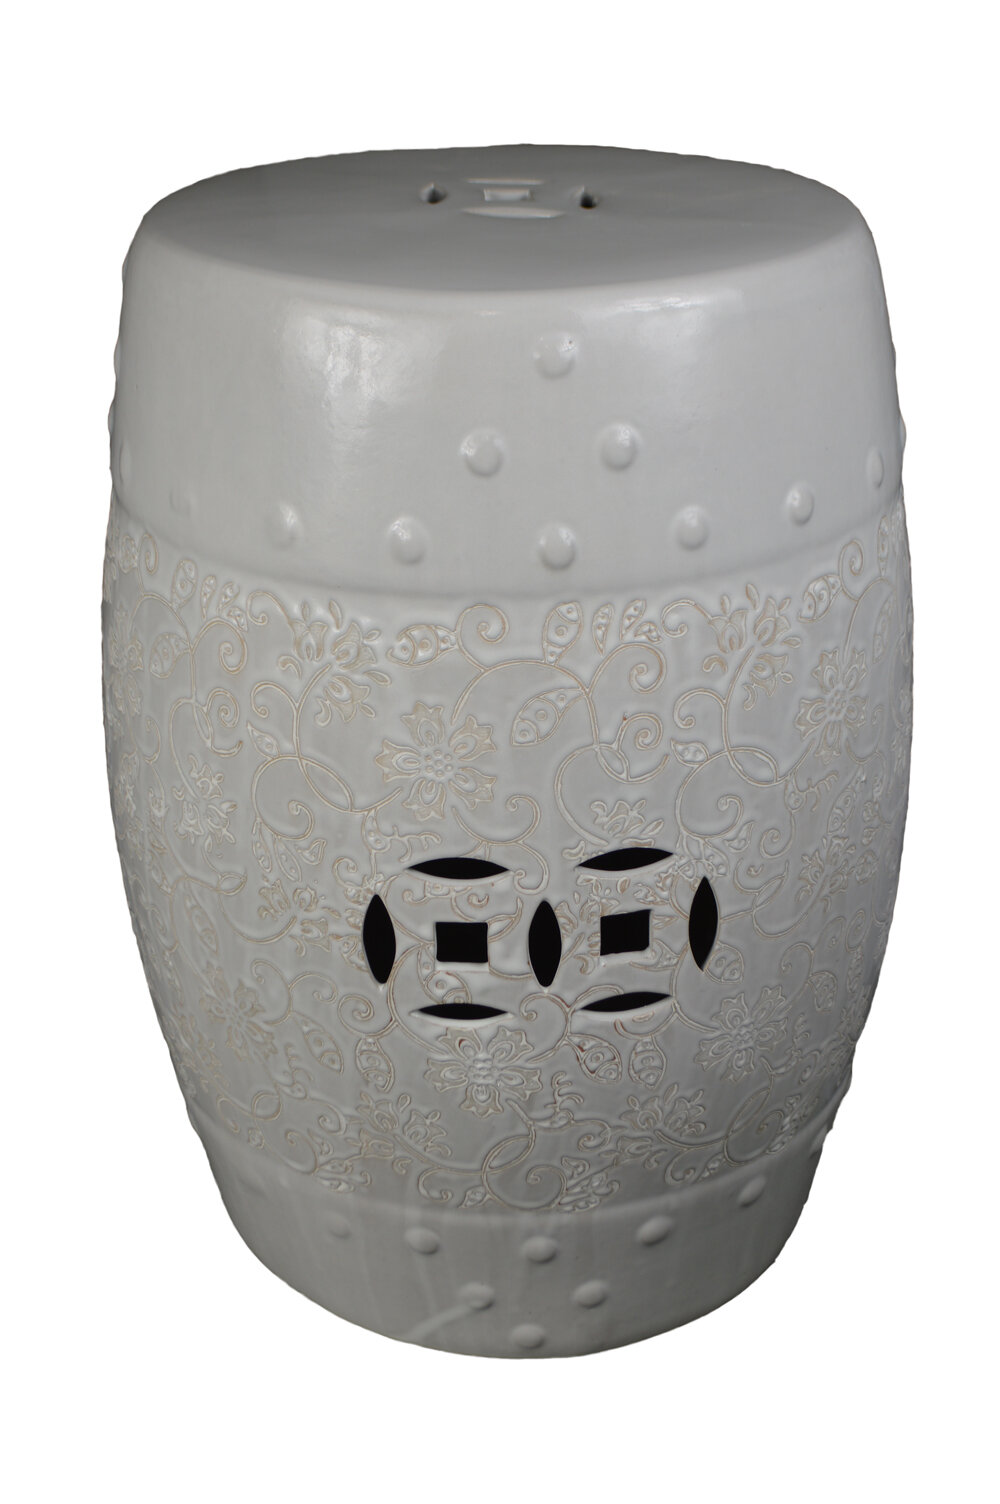 Swell Details About Charlton Home Iyanna Ceramic Garden Stool Machost Co Dining Chair Design Ideas Machostcouk